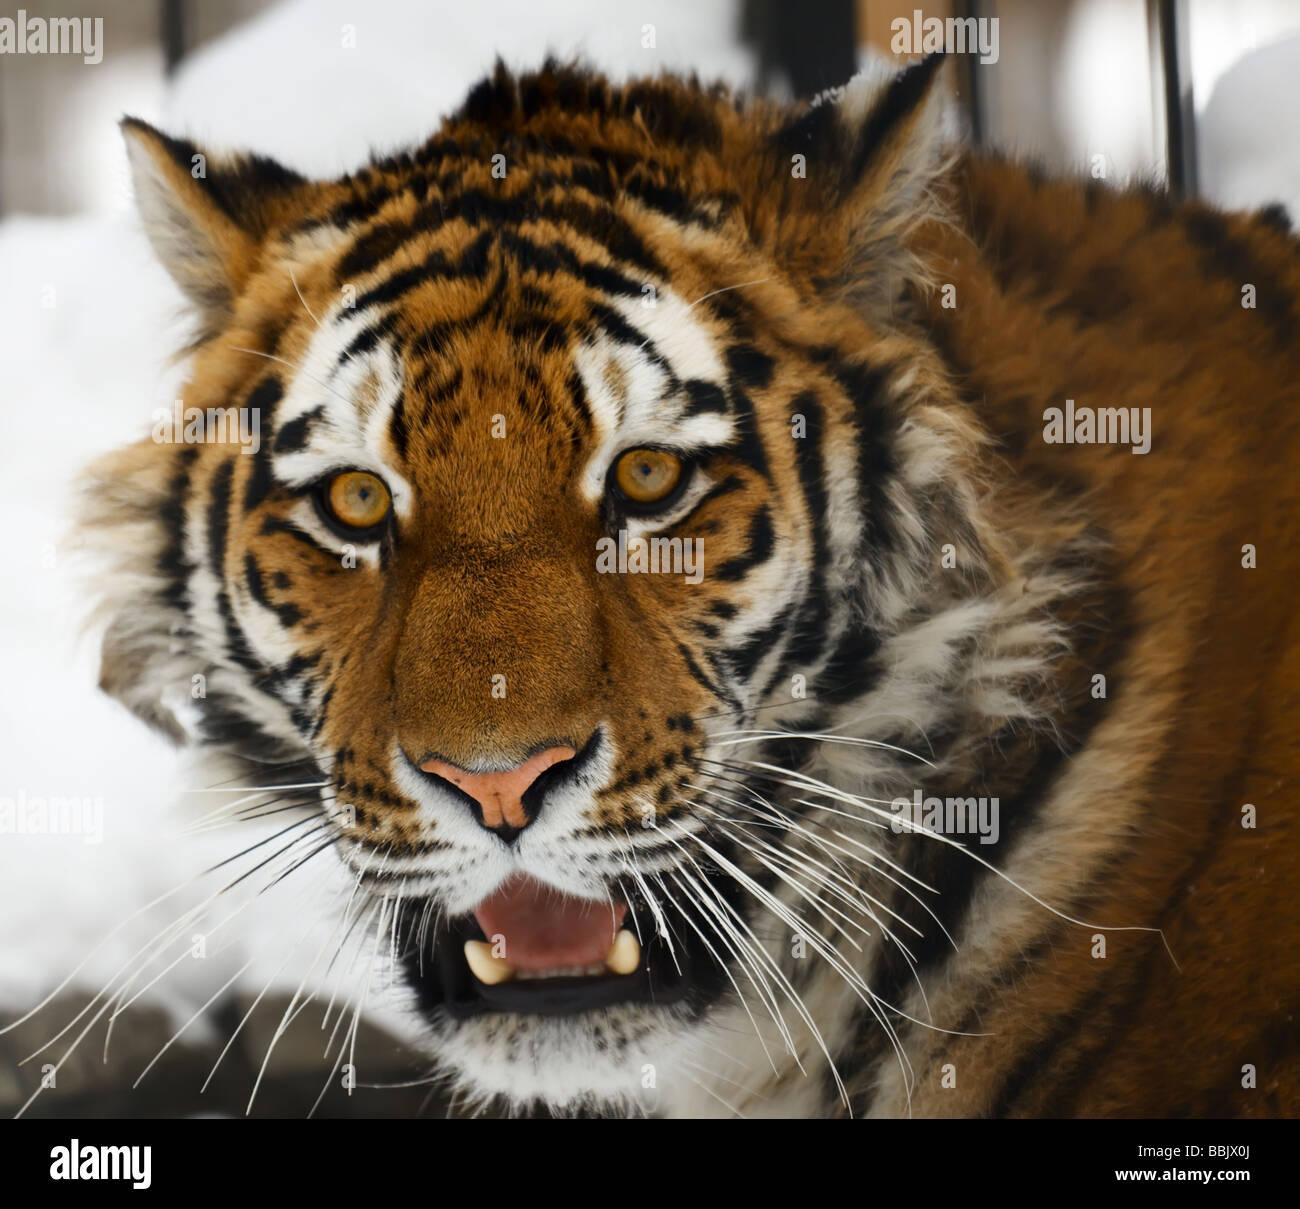 Yiung tiger portrait Novosibirsk ZOO - Stock Image